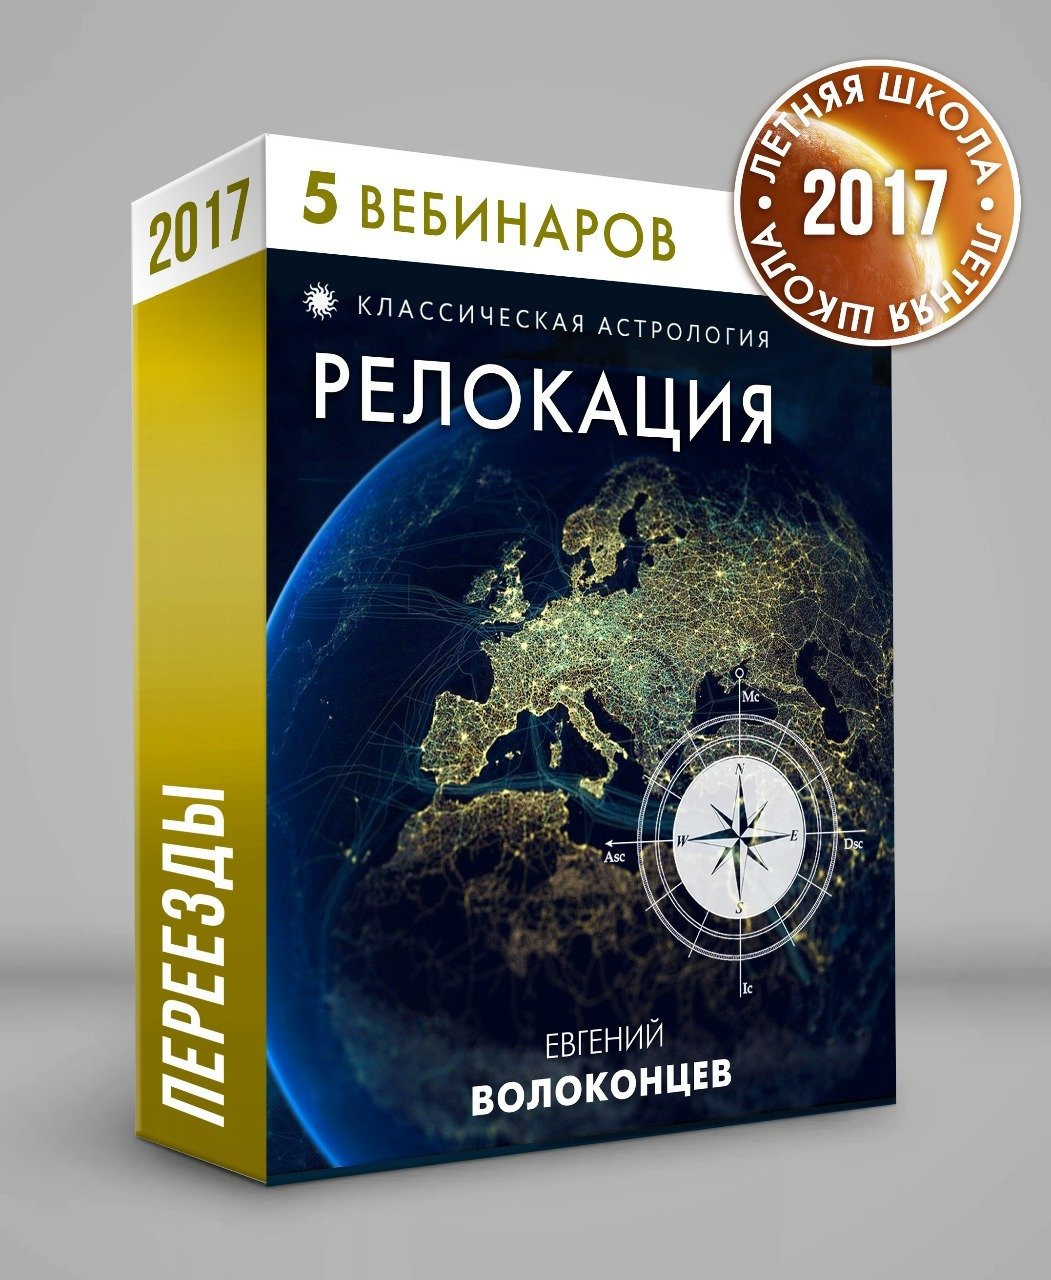 """РЕЛОКАЦИИ"" - астрология переезда, 4 вебинара по 3 часа + 4 презентации, 2017 г. 00003"